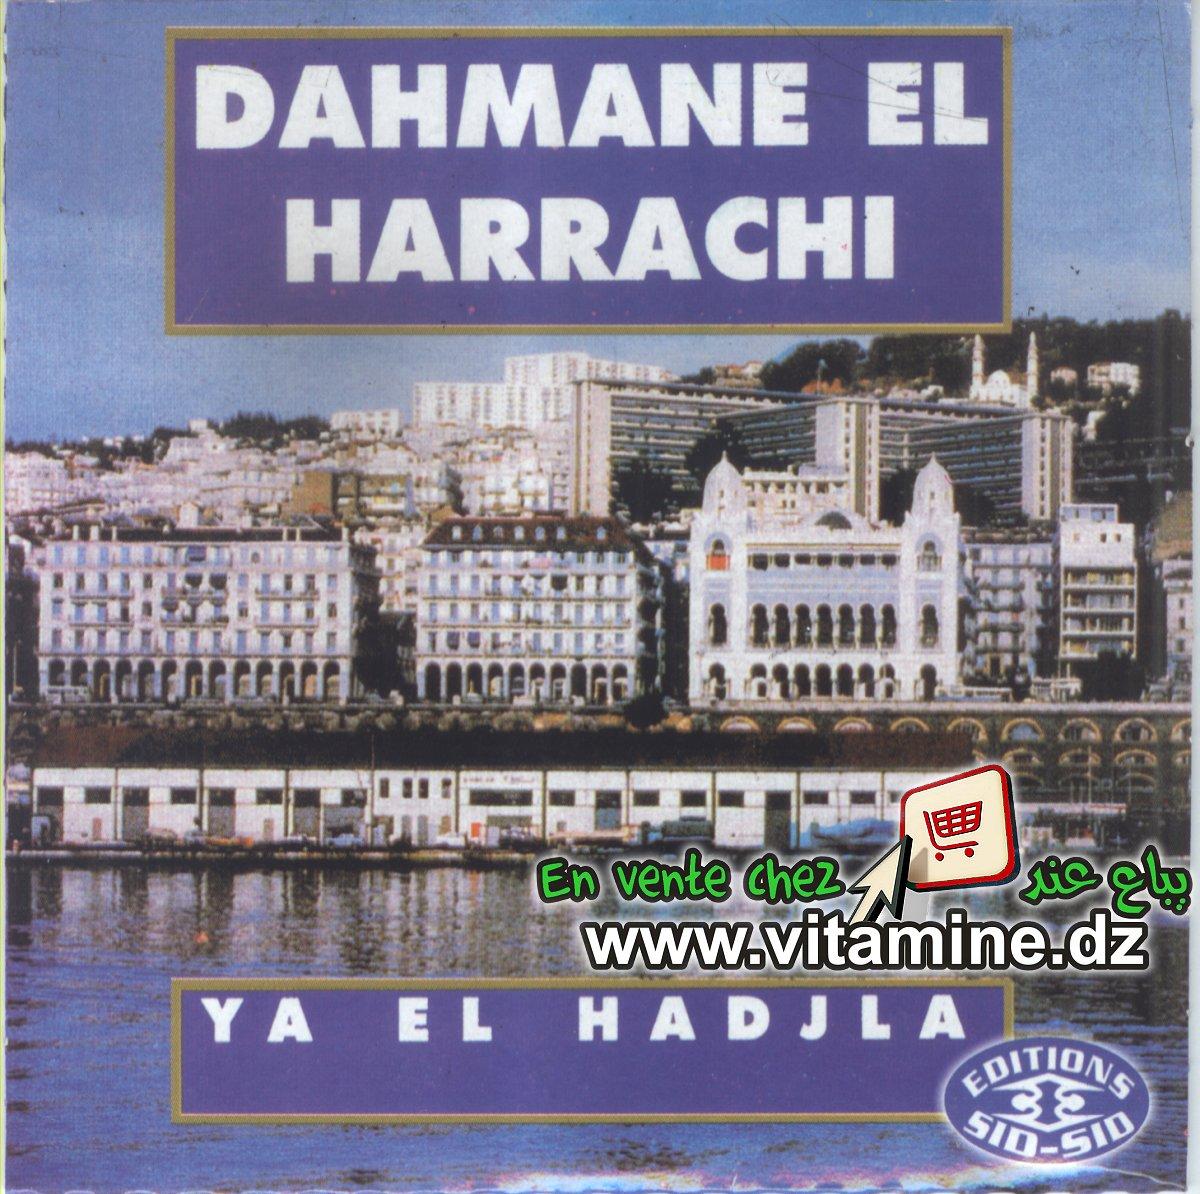 Dahmane El Harrachi - Ya el hadjla